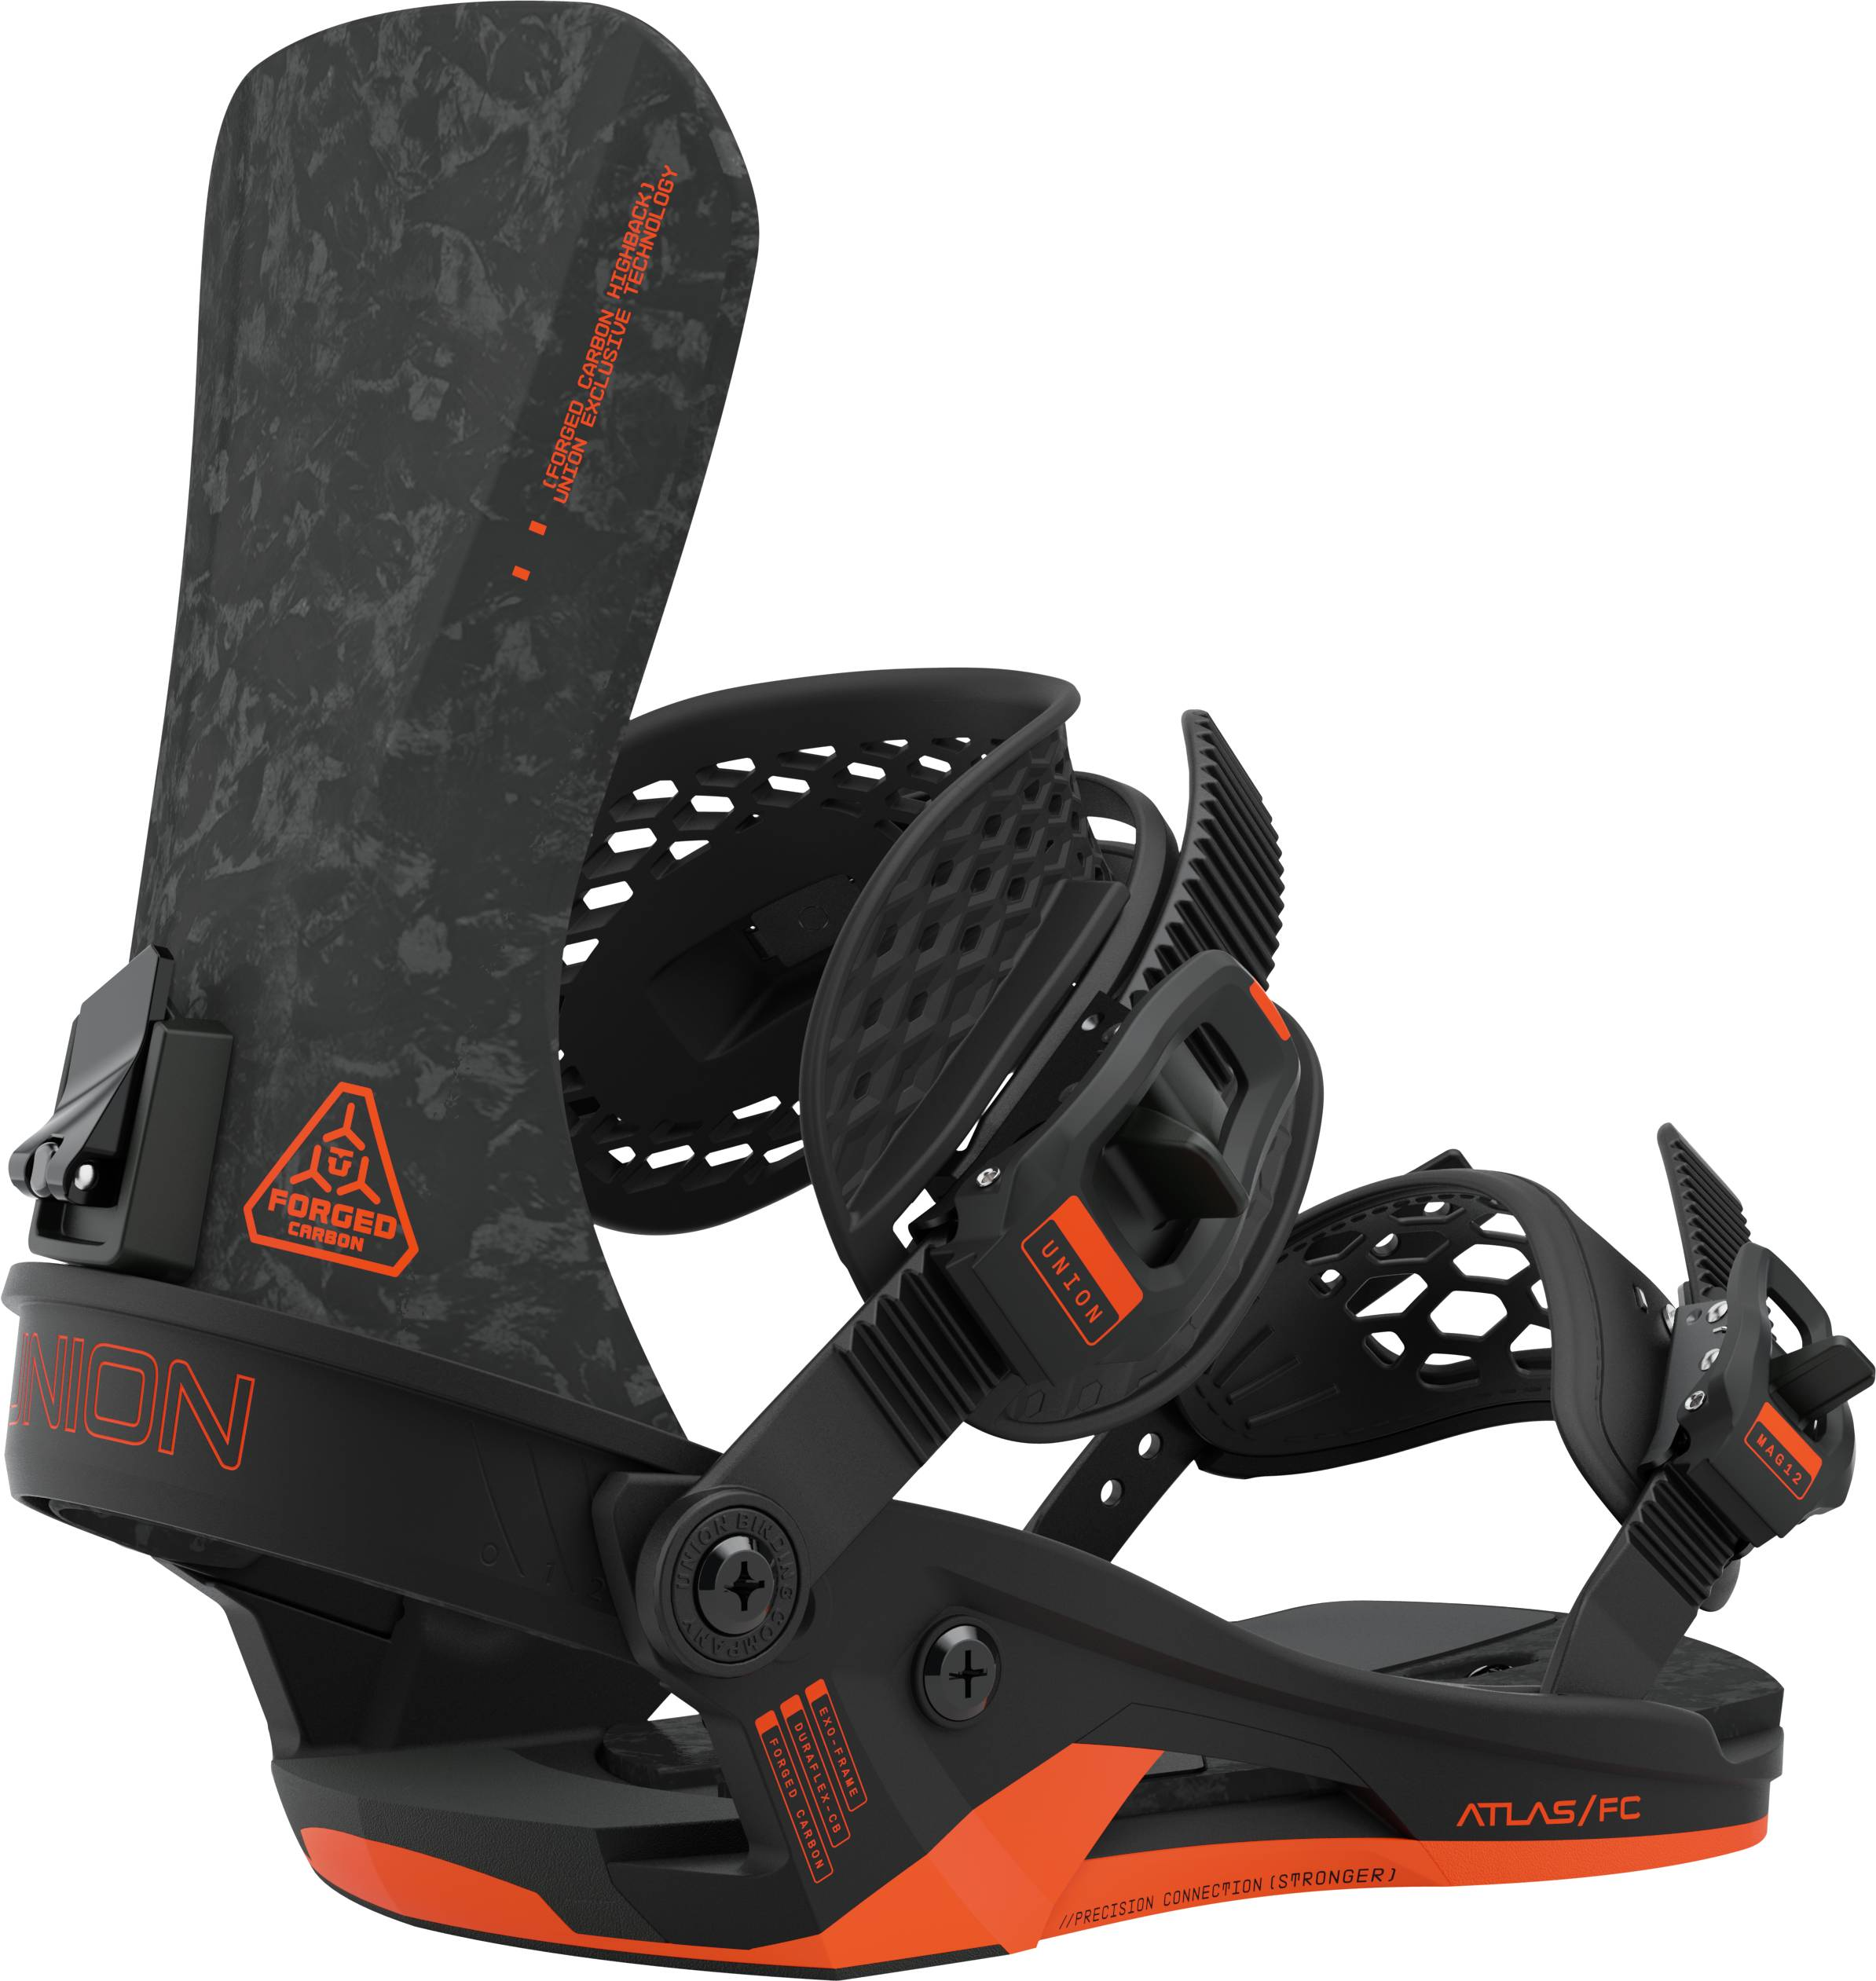 Union Atlas FC Snowboard Binding, M Black 2021